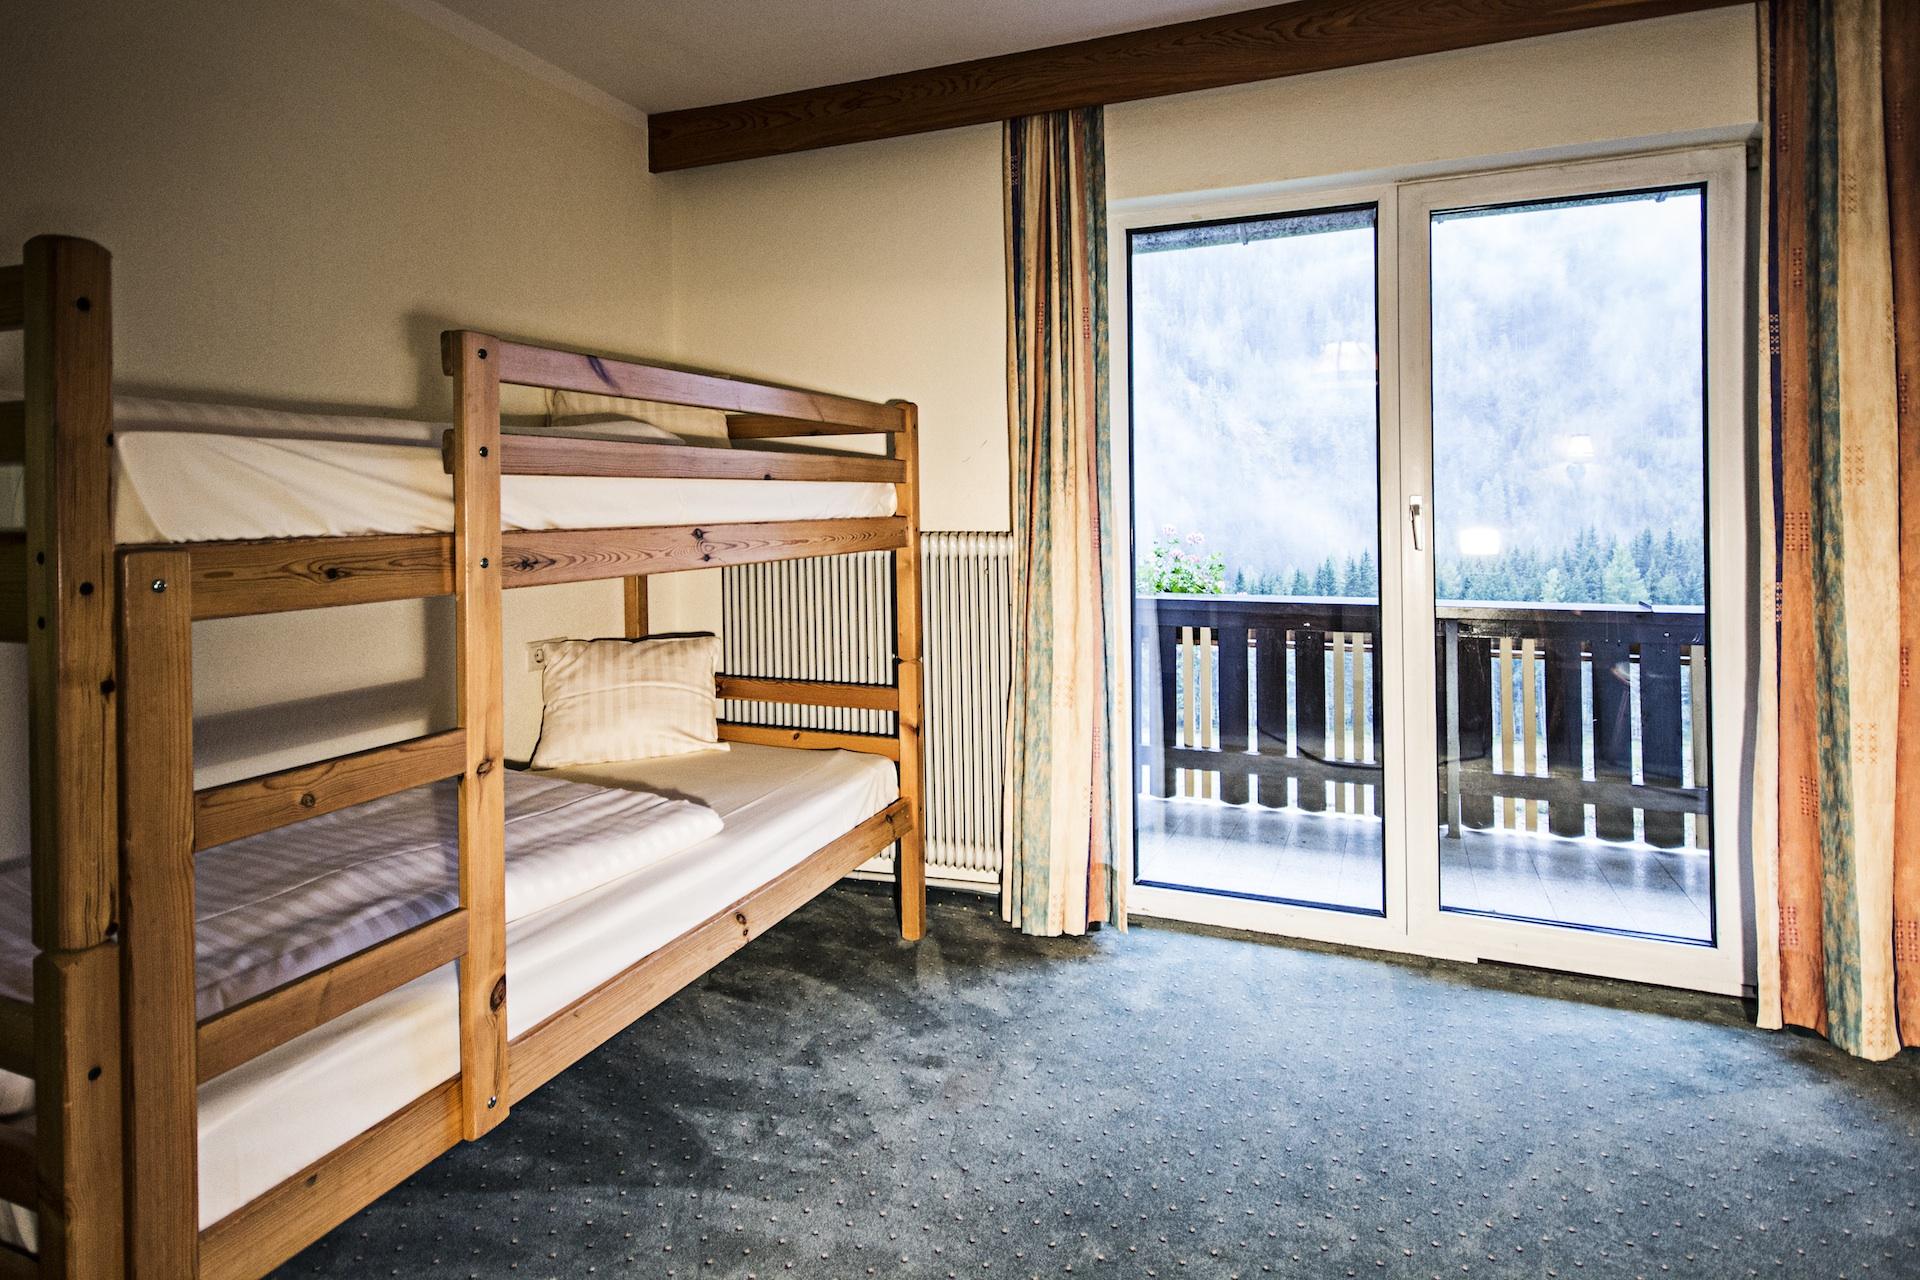 room4_2.jpg